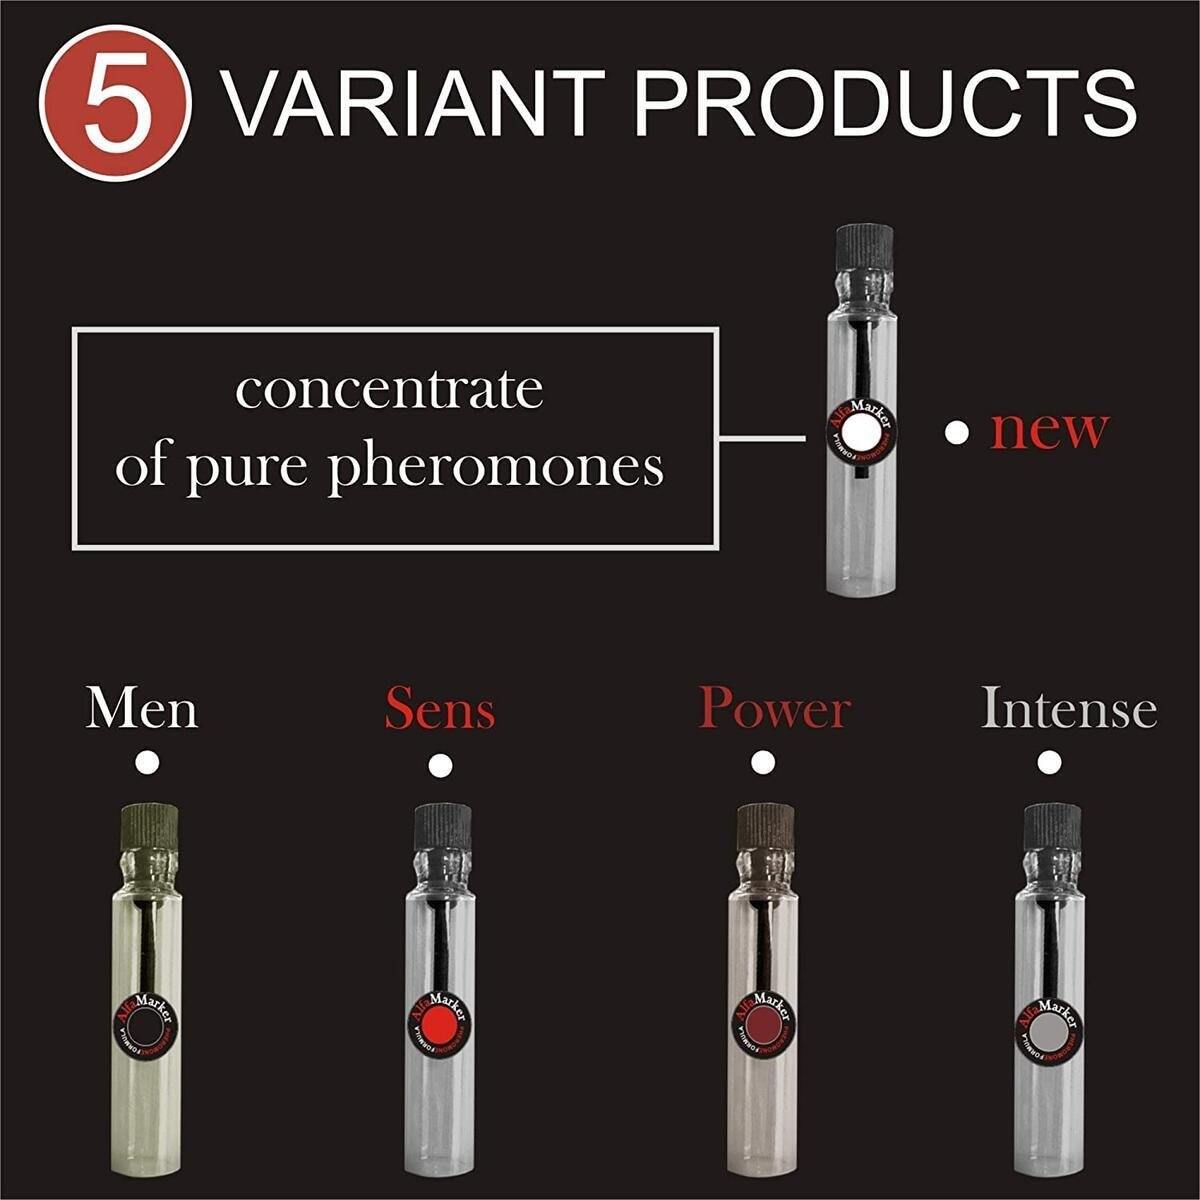 Alfamarker Pheromone Perfume Set for Men to Attract Women. 5 Male Pheromone Perfumes x 2ml